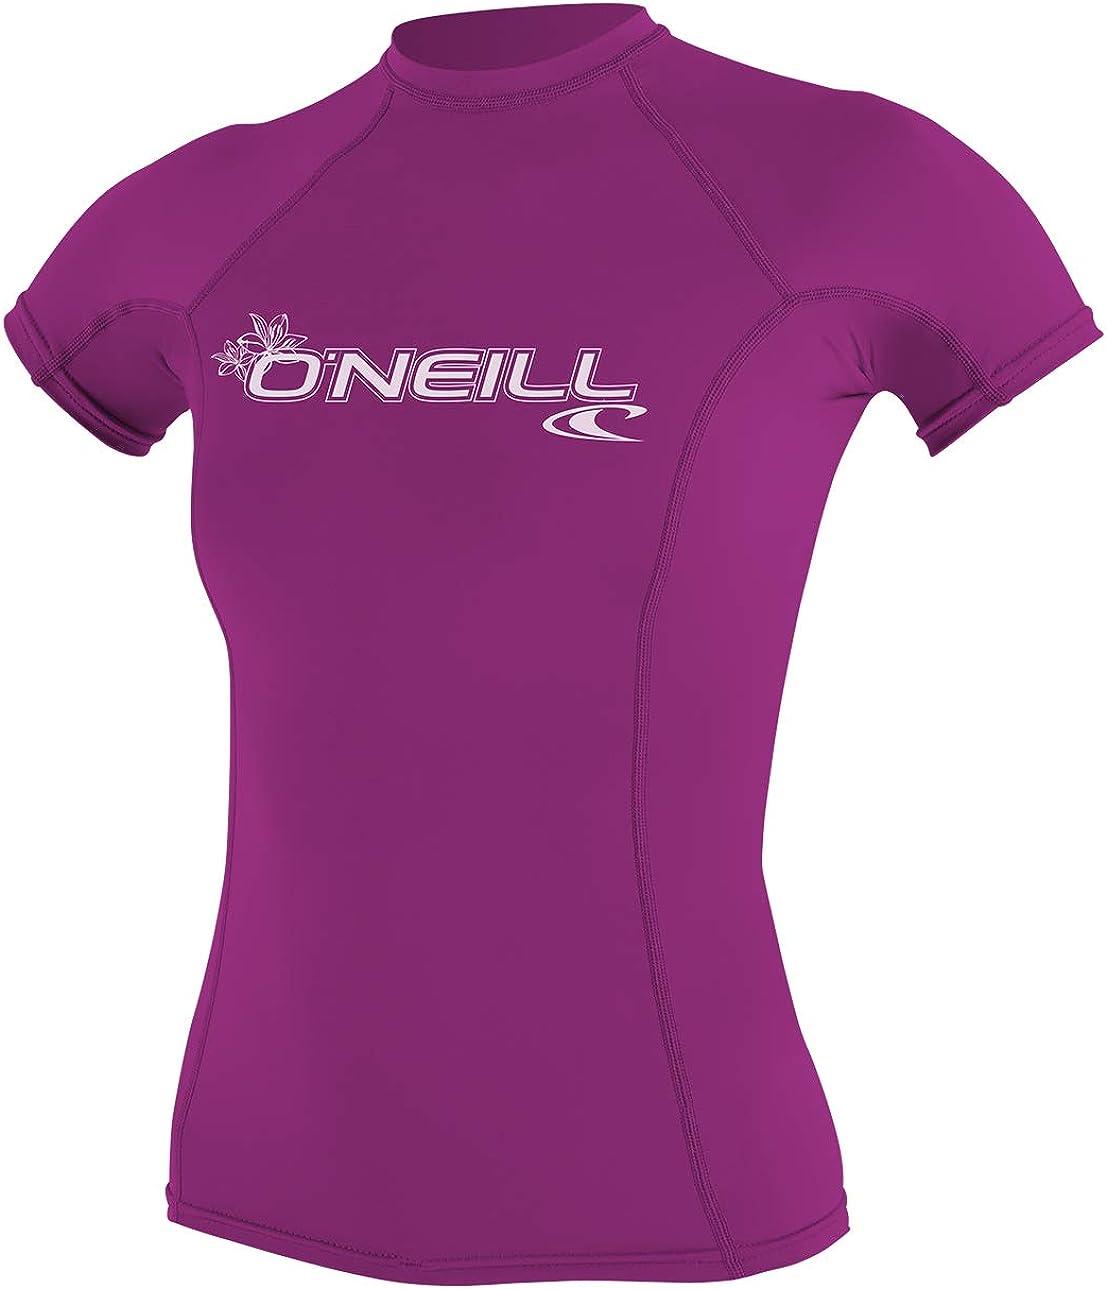 ONeill Wetsuits Enfants Youth Basic Skins S//S Crew T-Shirt Rashguard